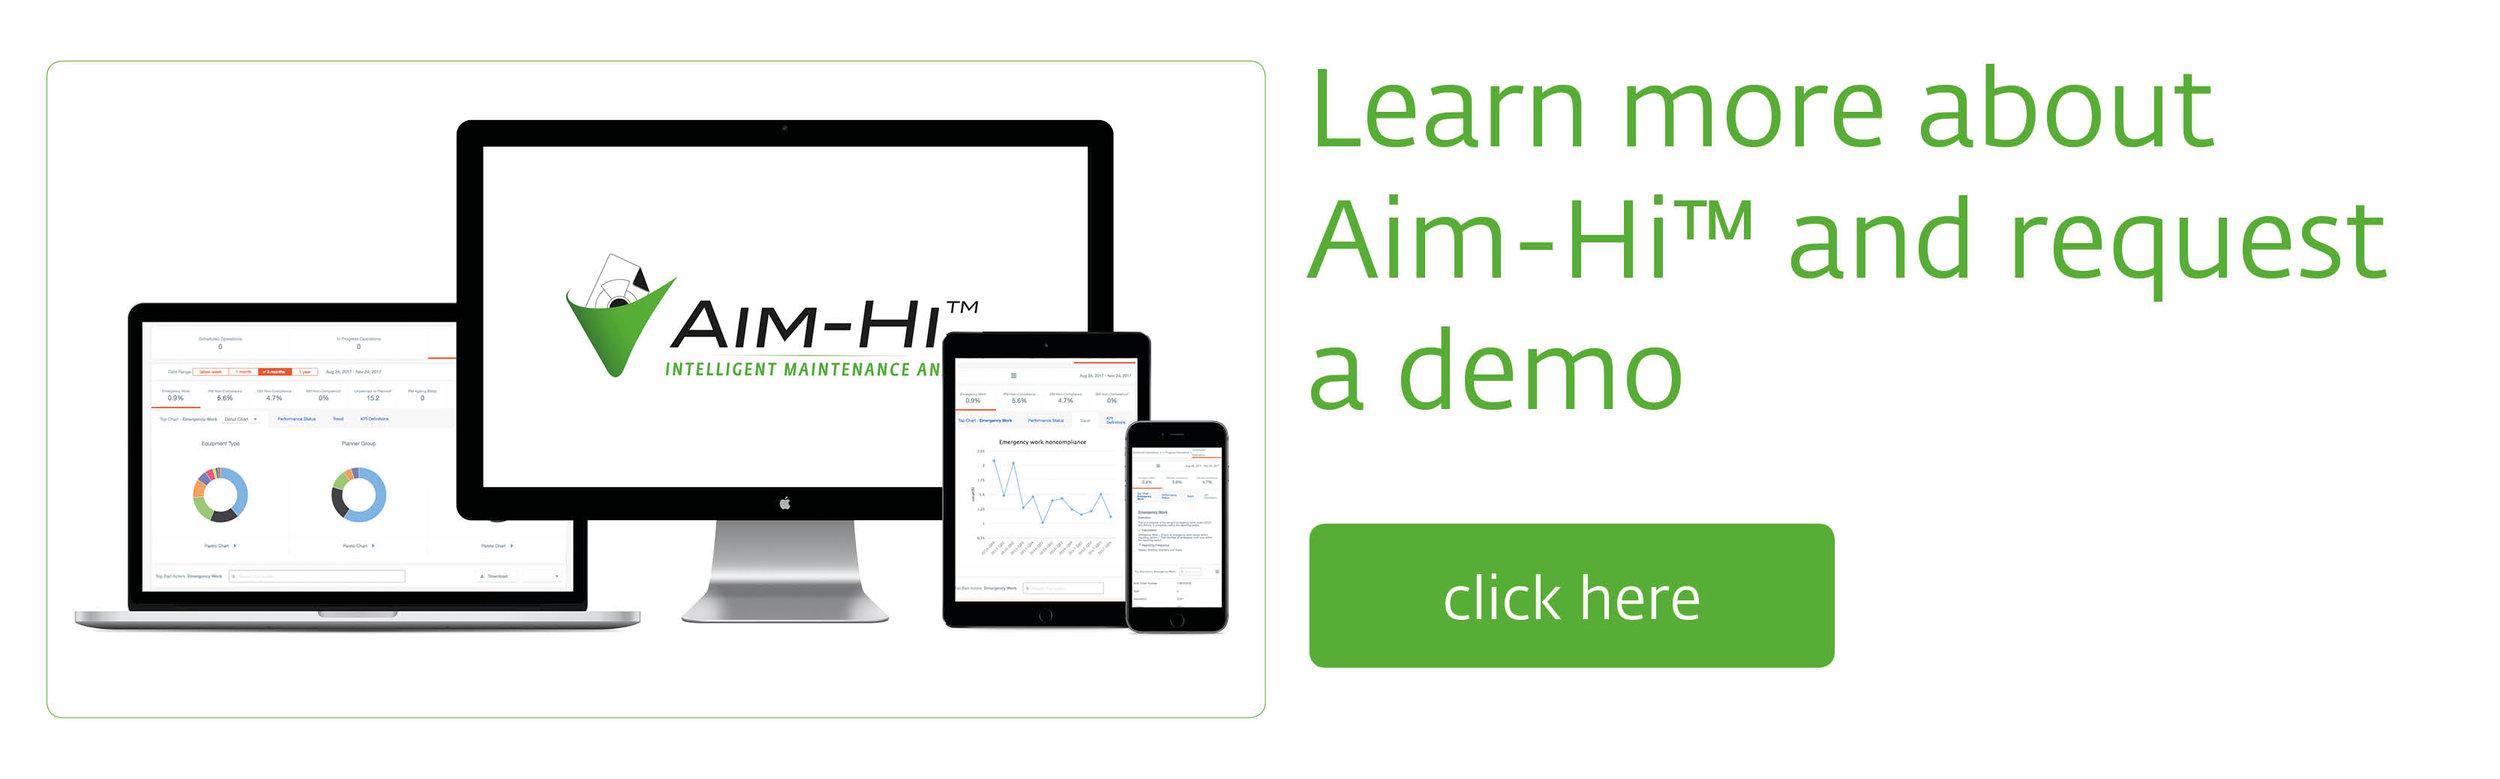 AE_Web_Button_Aim-Hi_Request_Demo_Alter2.jpg